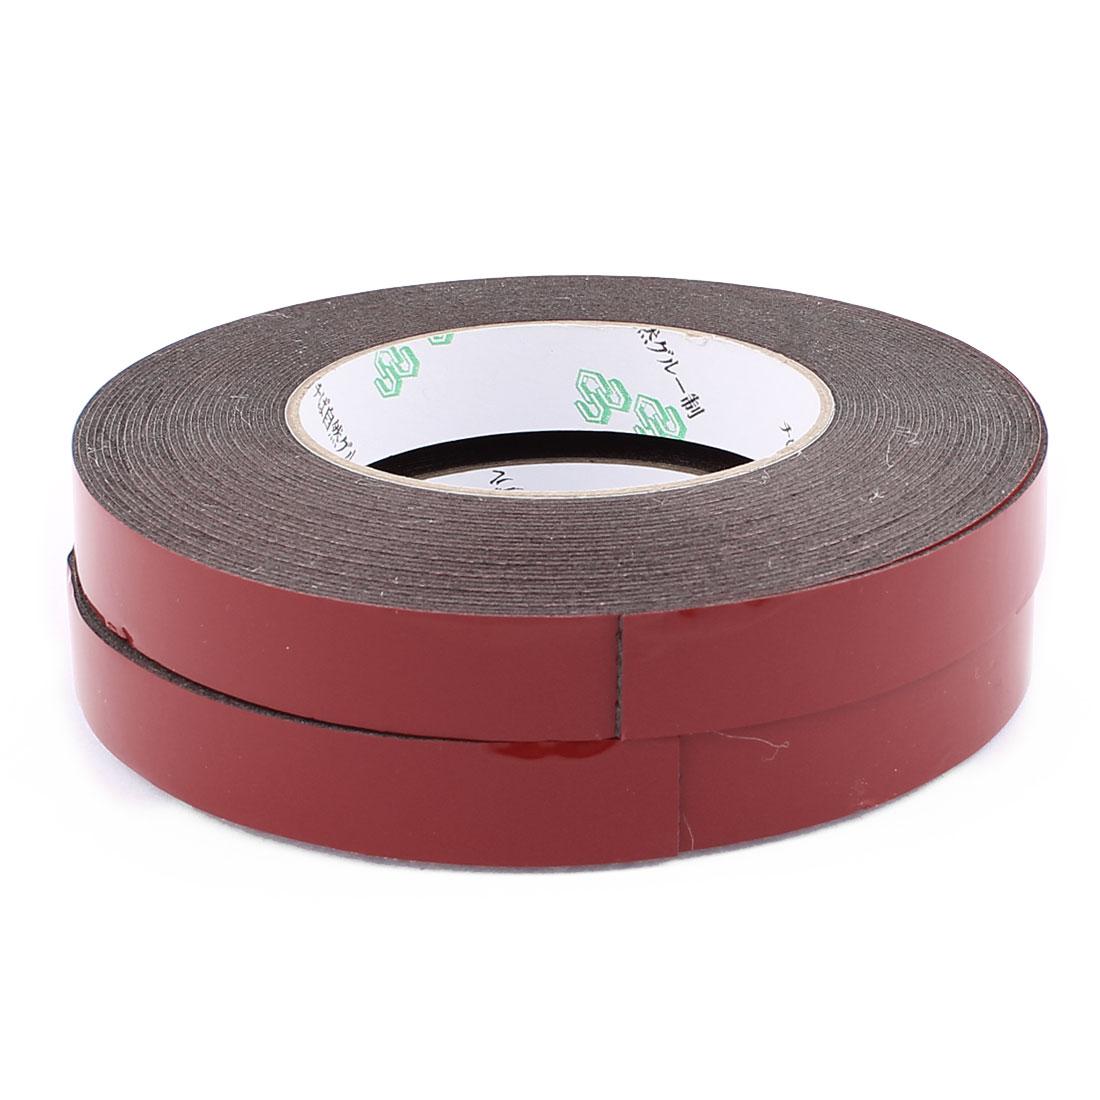 2 Pcs 1.8CM Width 10M Length 1MM Thick Dual Sided Sealing Shockproof Sponge Tape